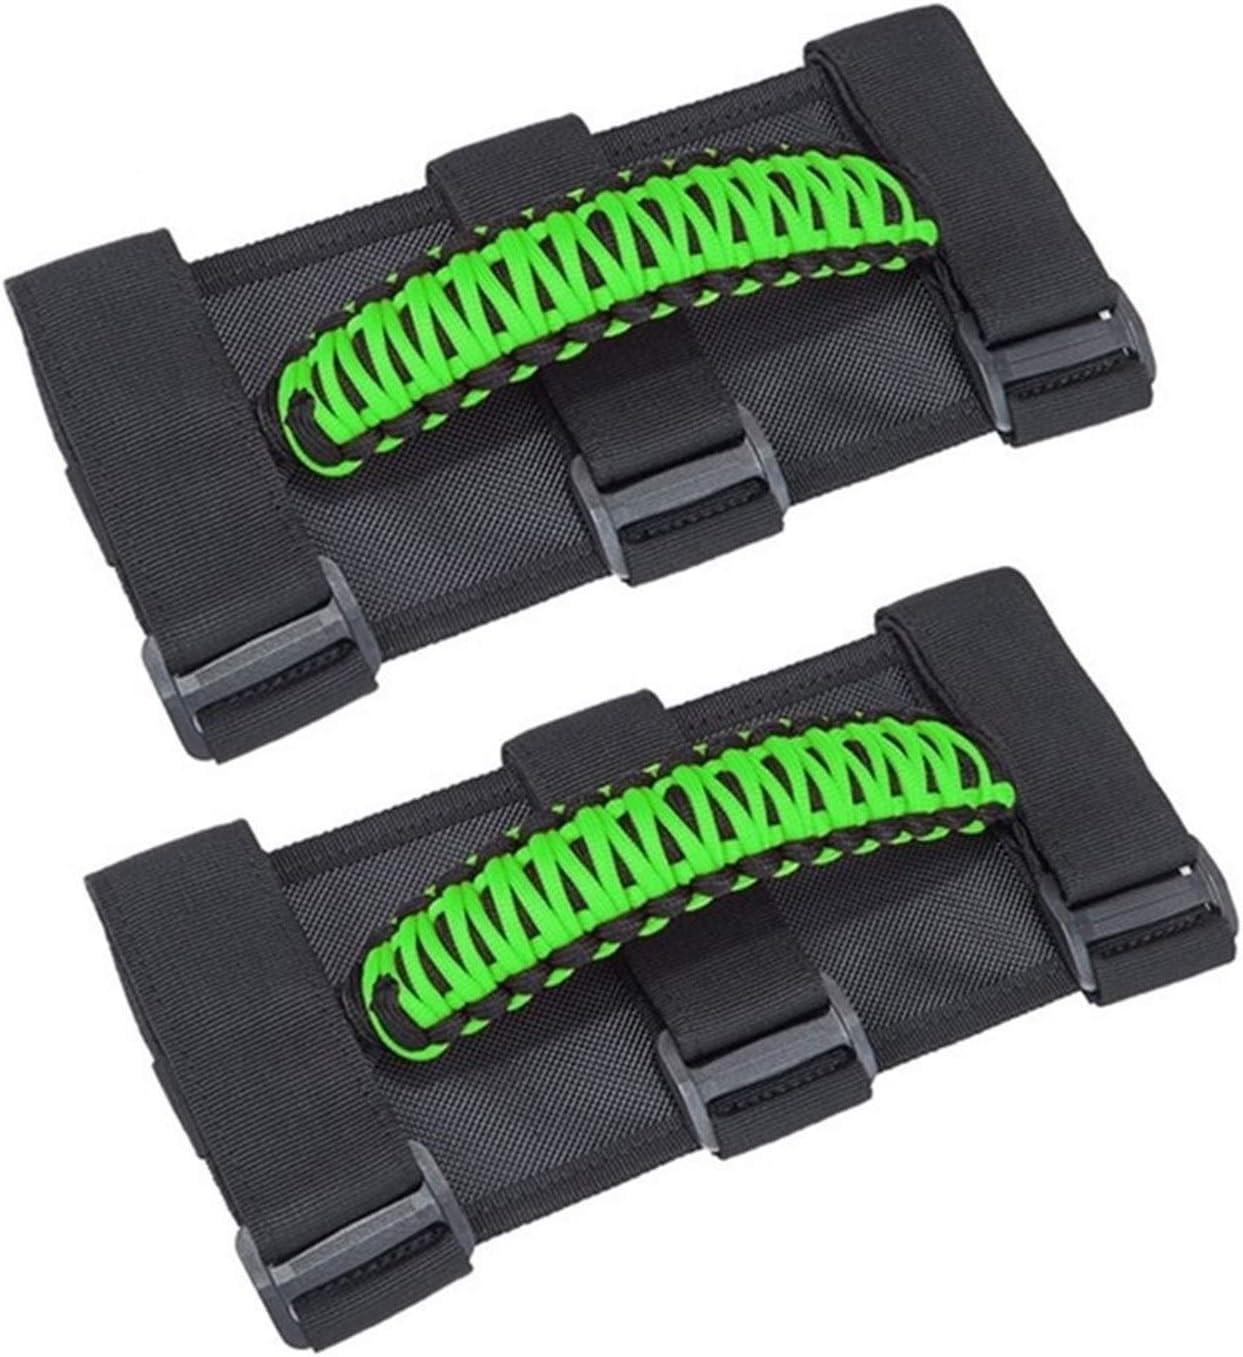 Color : Green VITKT 2pcs Door Grab Handle Fit For Jeep Wrangler JK JL YJ TJ 1987-2020 Roll Bar Hand Grip Non-slip Weaved Handle Car parts inner door handle